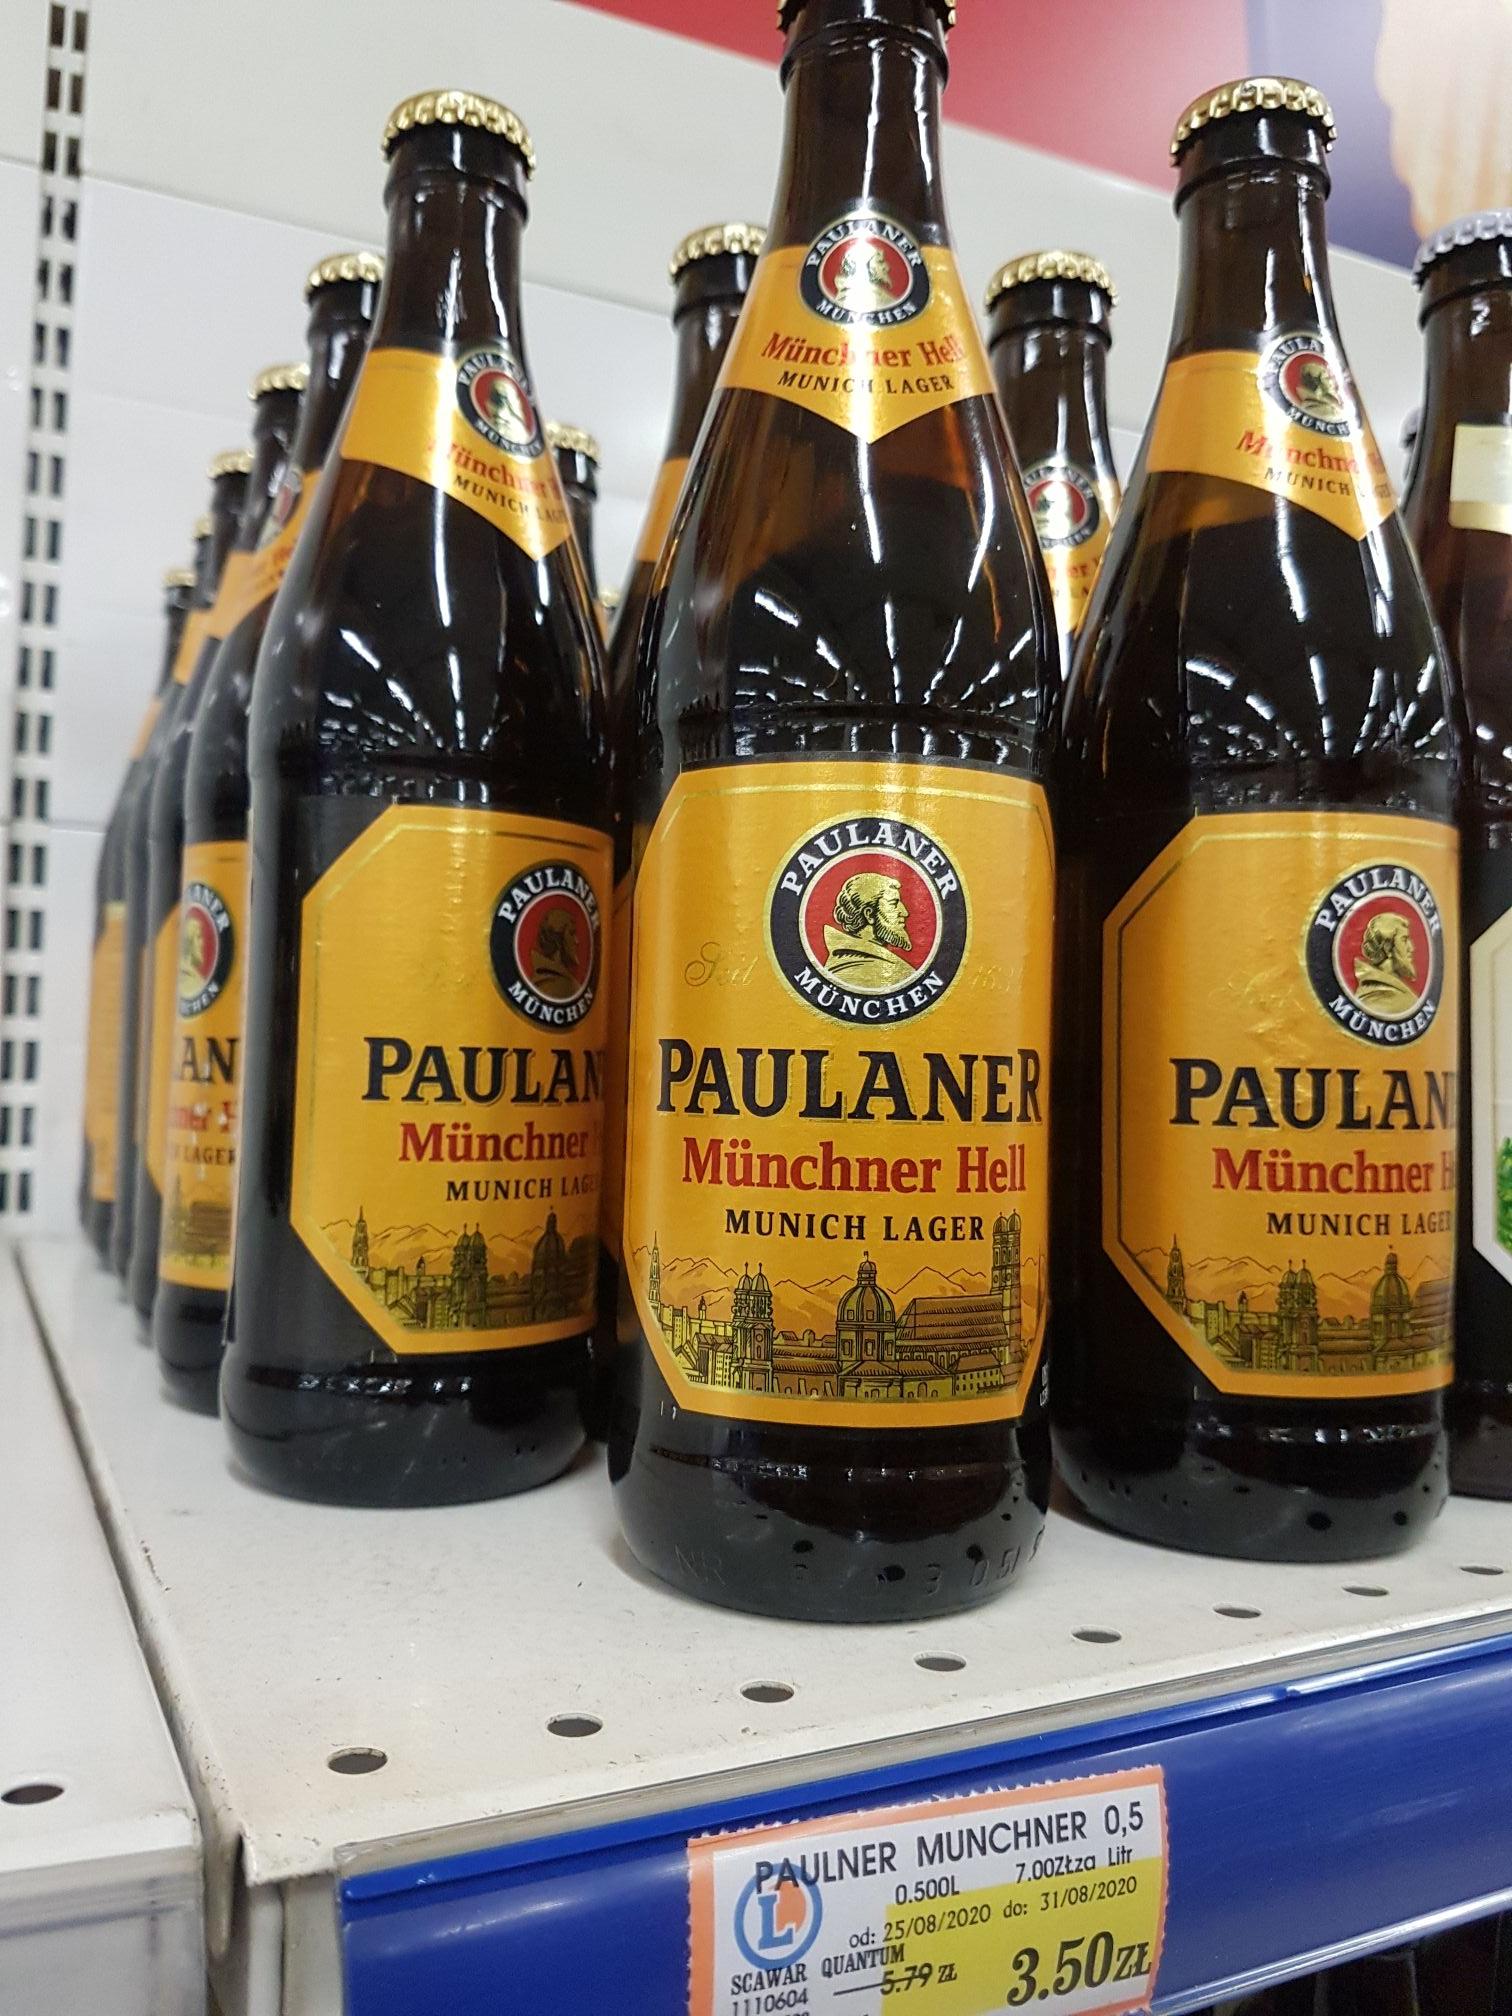 Piwo Paulaner Munchner Hell Munich Lager @Leclerc Lublin